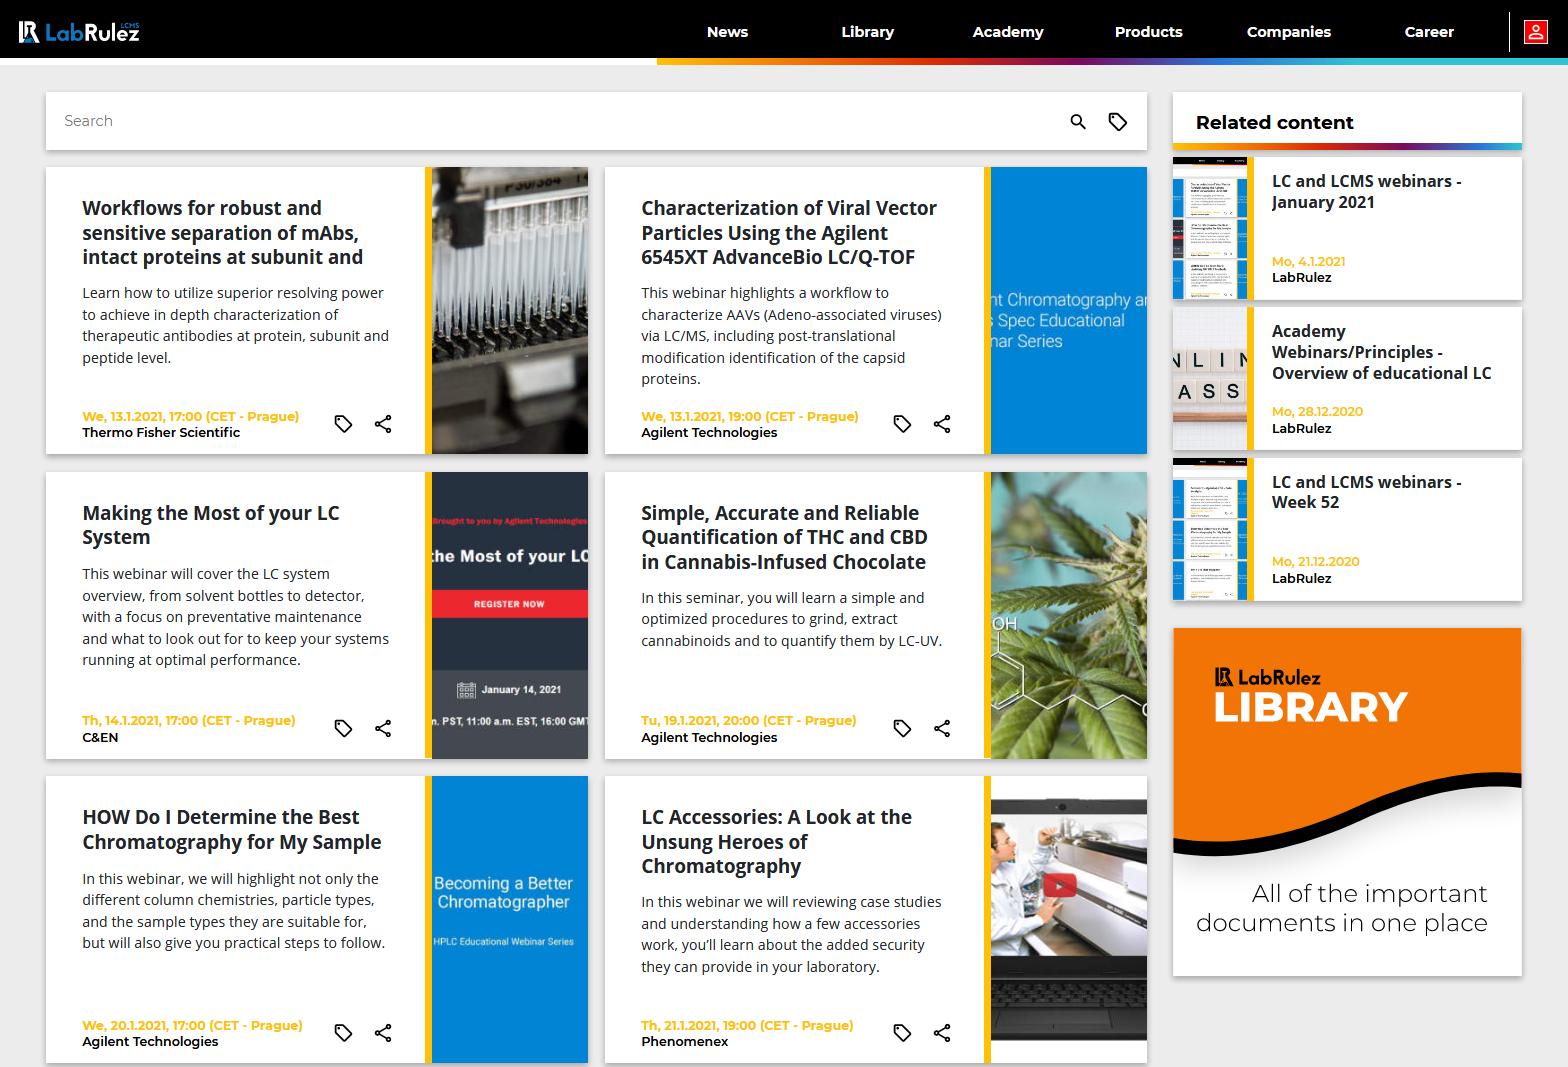 LabRulez: LC and LCMS webinars - January 2021 (2)